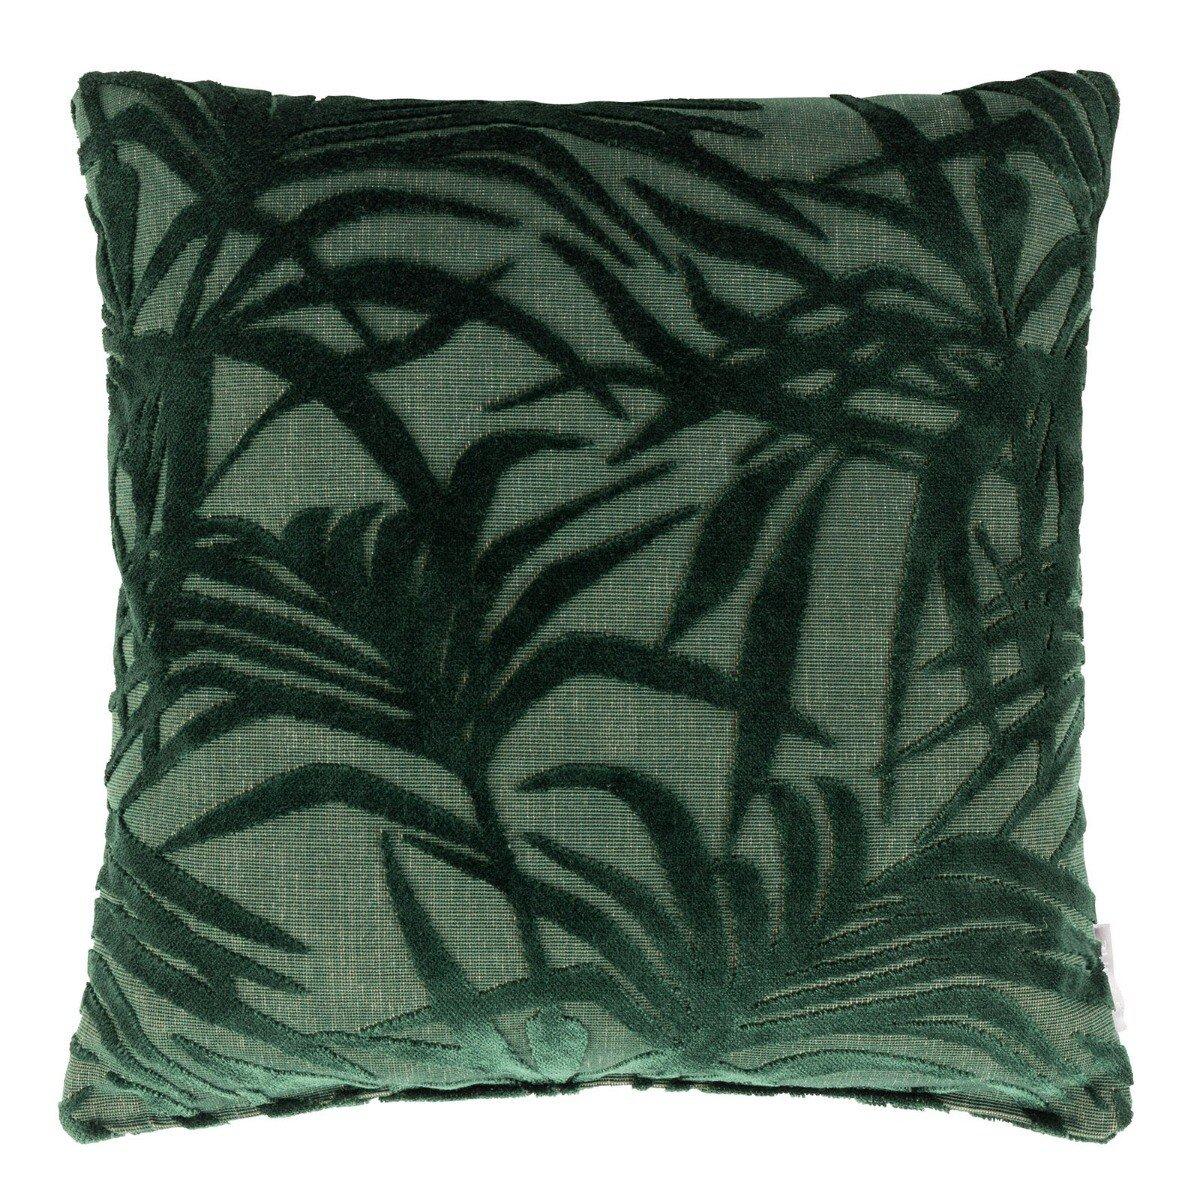 Zuiver Kussen Miami Palm Tree green 45 x 45